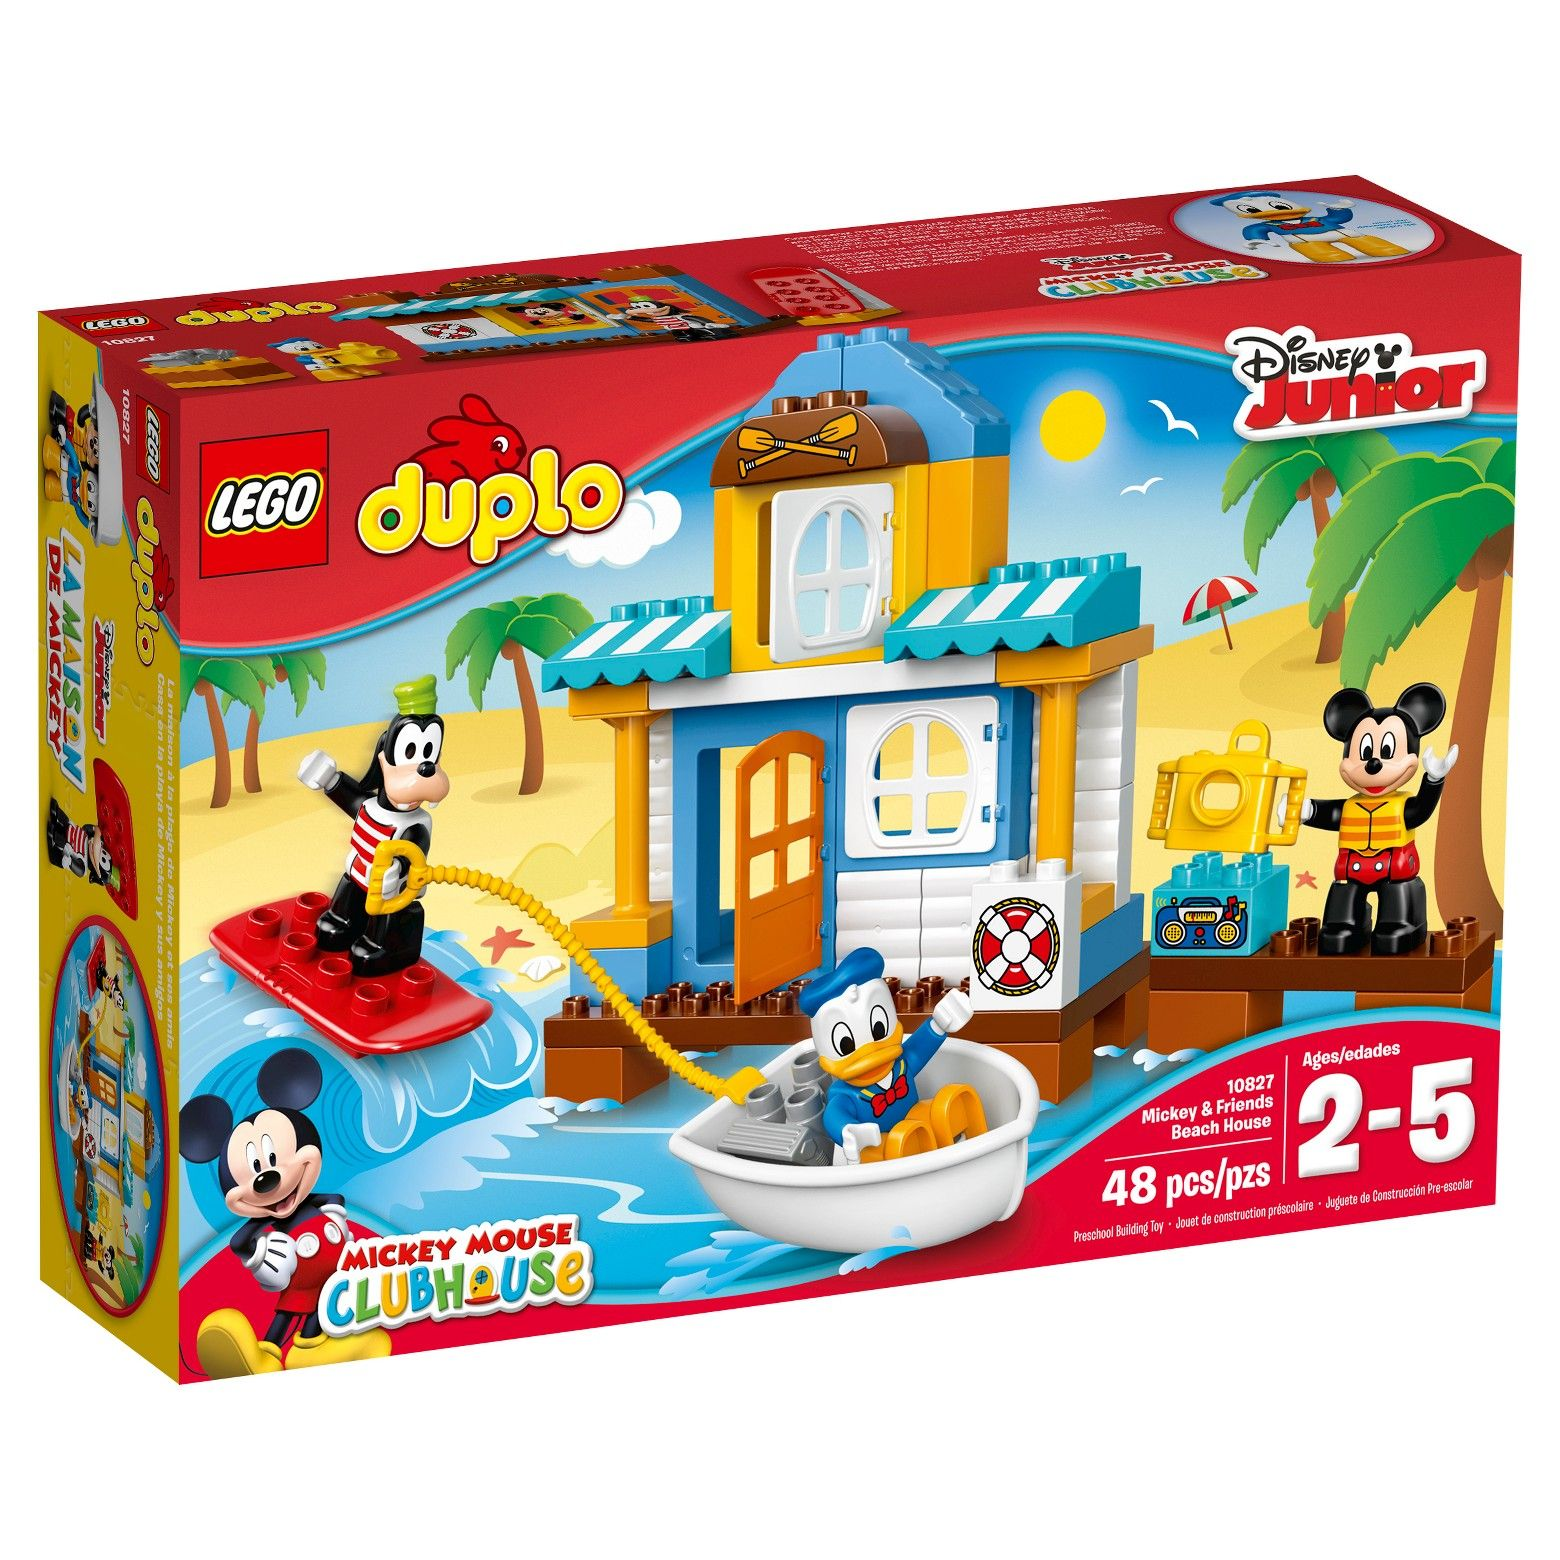 Mickey Mouse Clubhouse Beach House Duple Lego Duplo Duplo Duplo Mickey Mouse